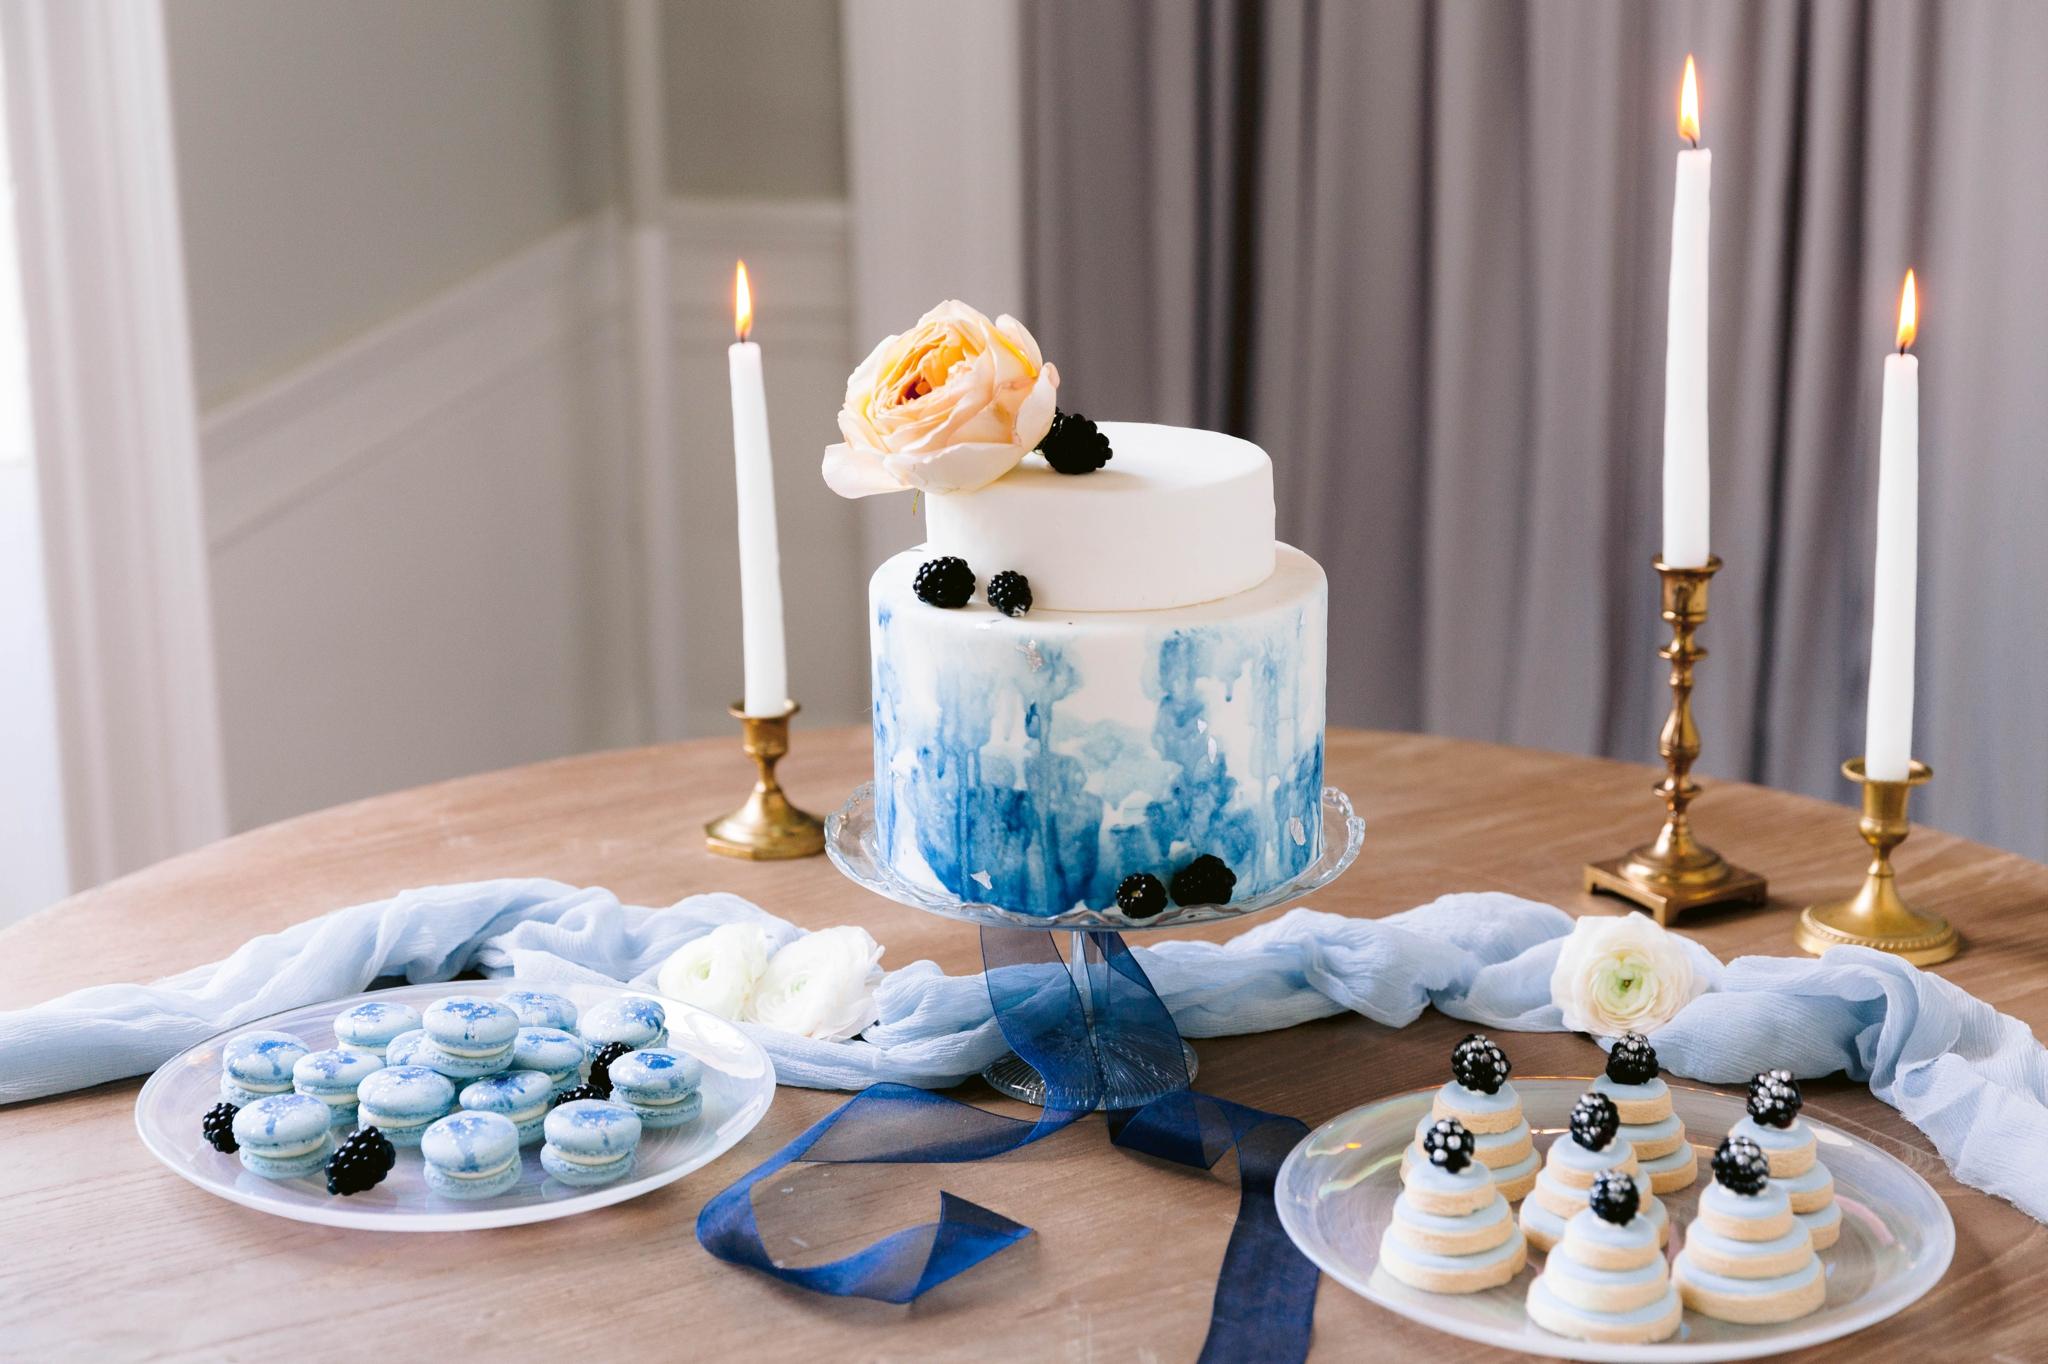 Pastel Blue Wedding Fine Art Wedding Inspiration - Honolulu, Oahu, Hawaii Wedding Photographer - Johanna Dye Photography 15.jpg